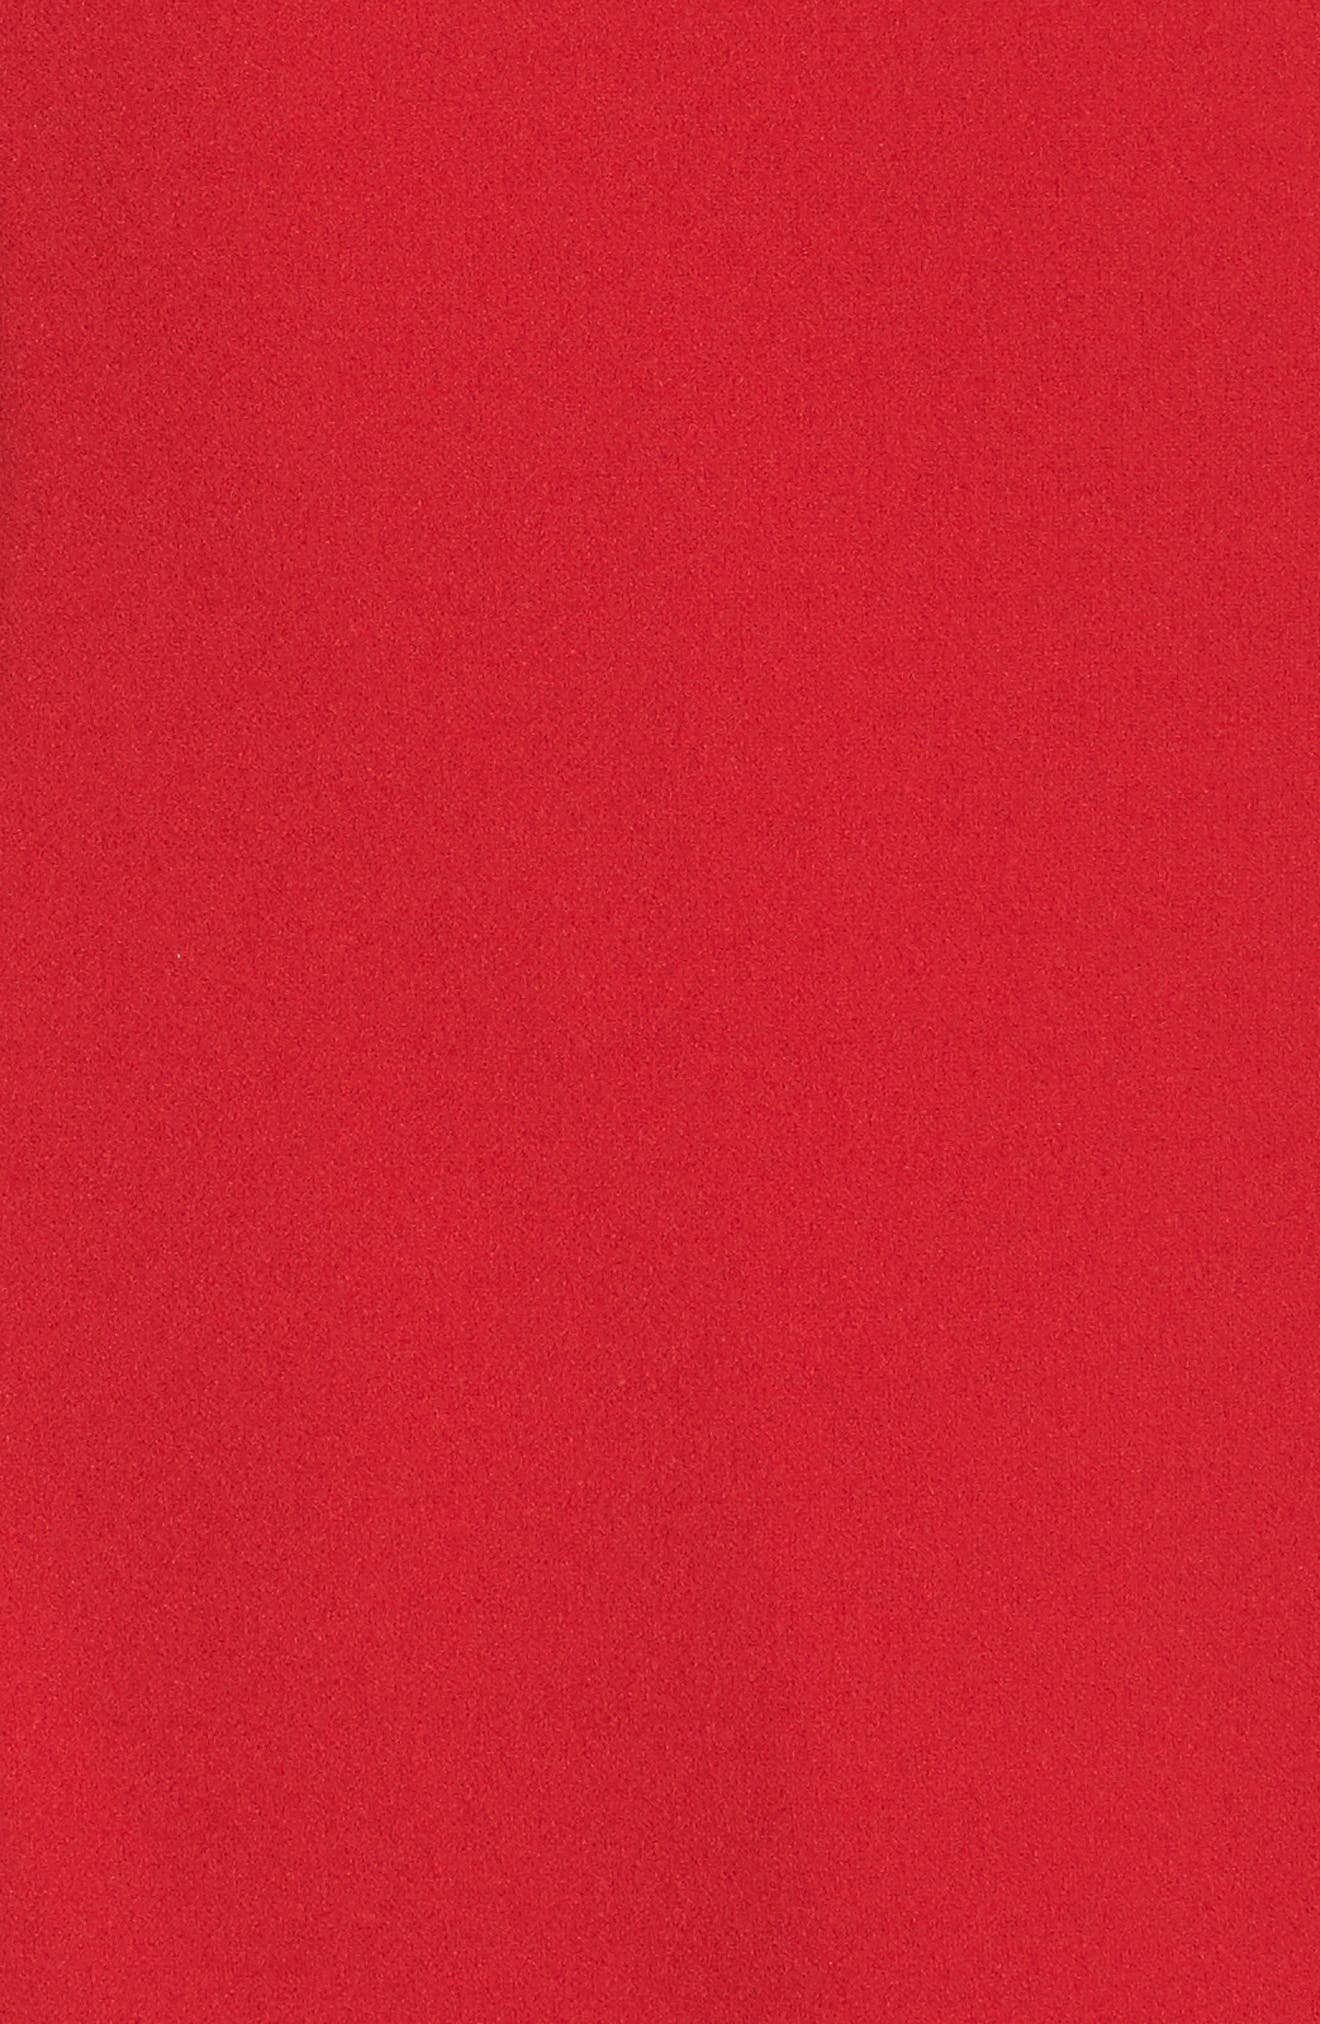 Ruffle Crepe Halter Dress,                             Alternate thumbnail 5, color,                             Red